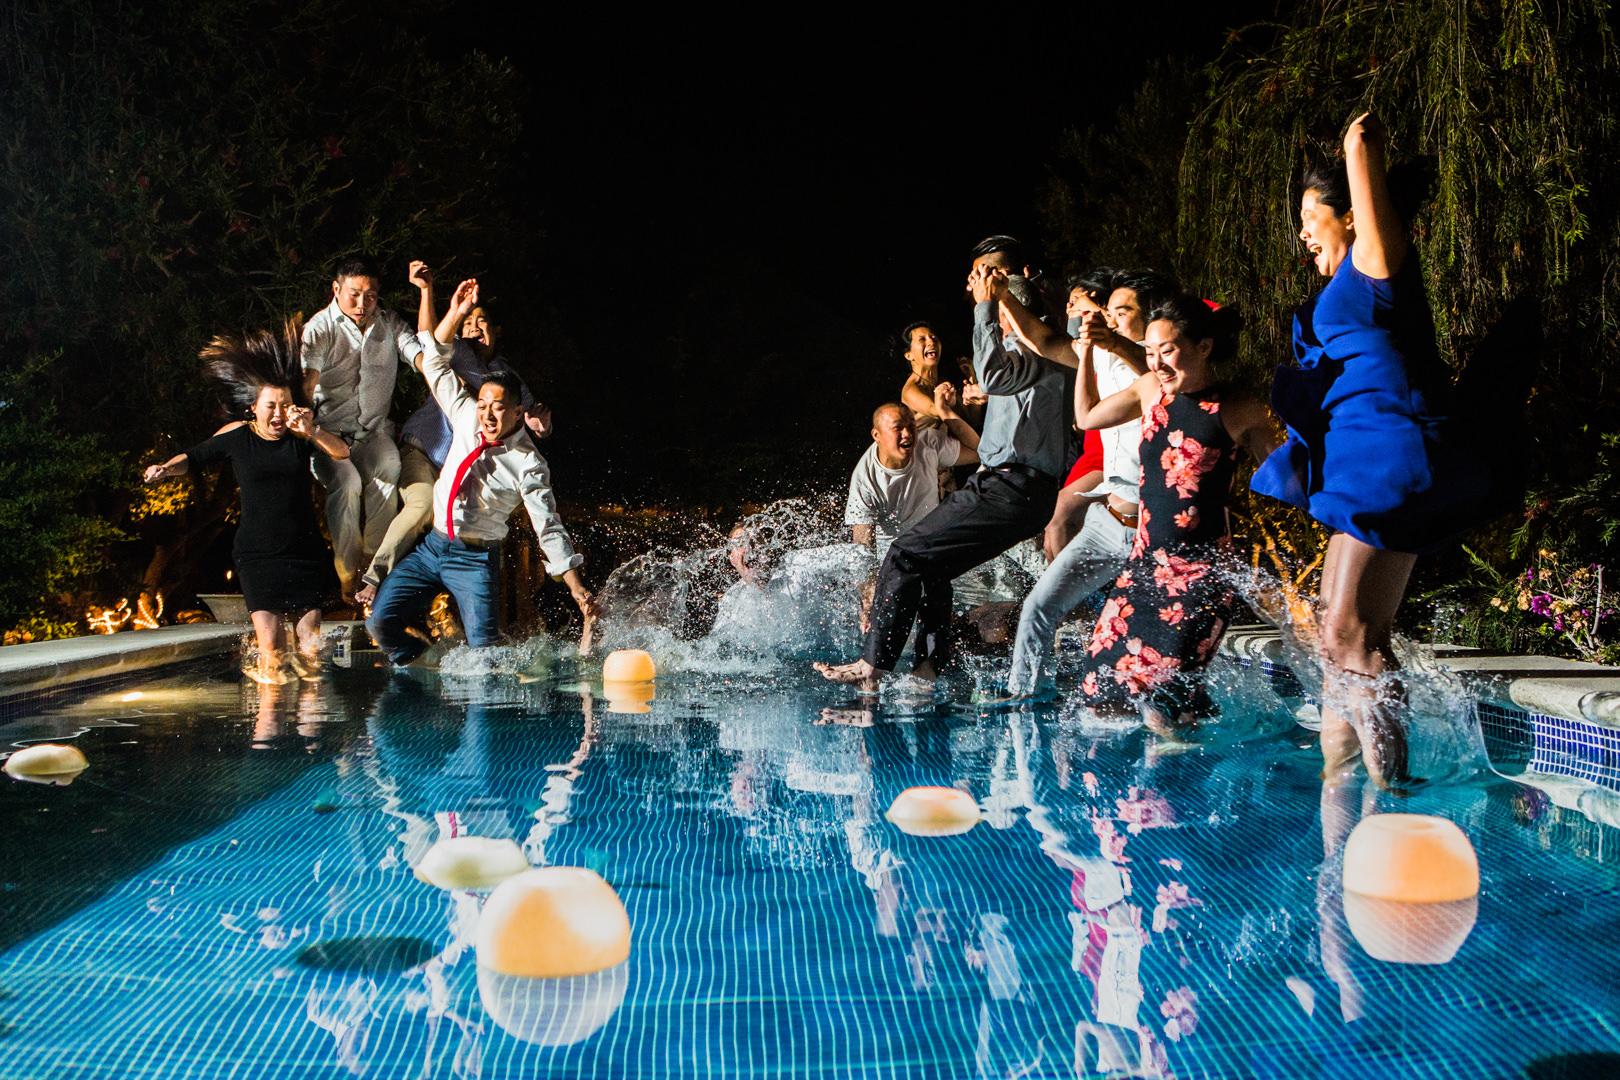 Boda-Hacienda-San-Rafael-Sevilla-engagement-Rafael-Torres-fotografo-bodas-sevilla-madrid-barcelona-wedding-photographer--111.jpg